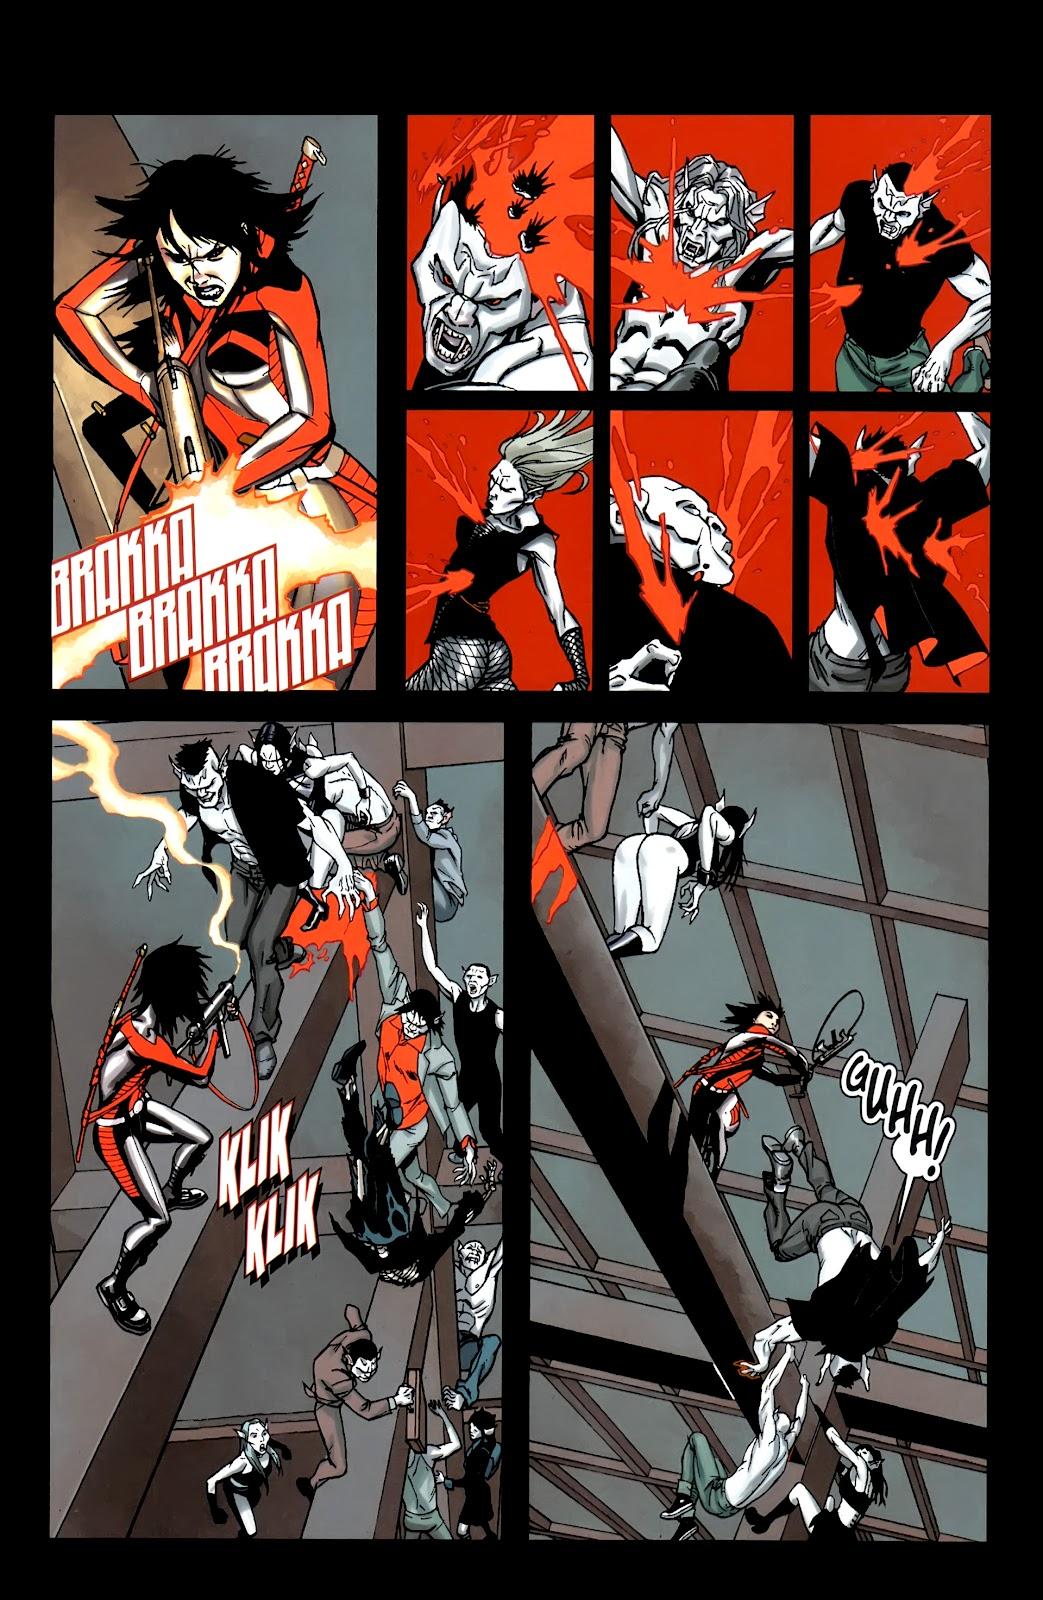 Read online Shinku comic -  Issue #5 - 14